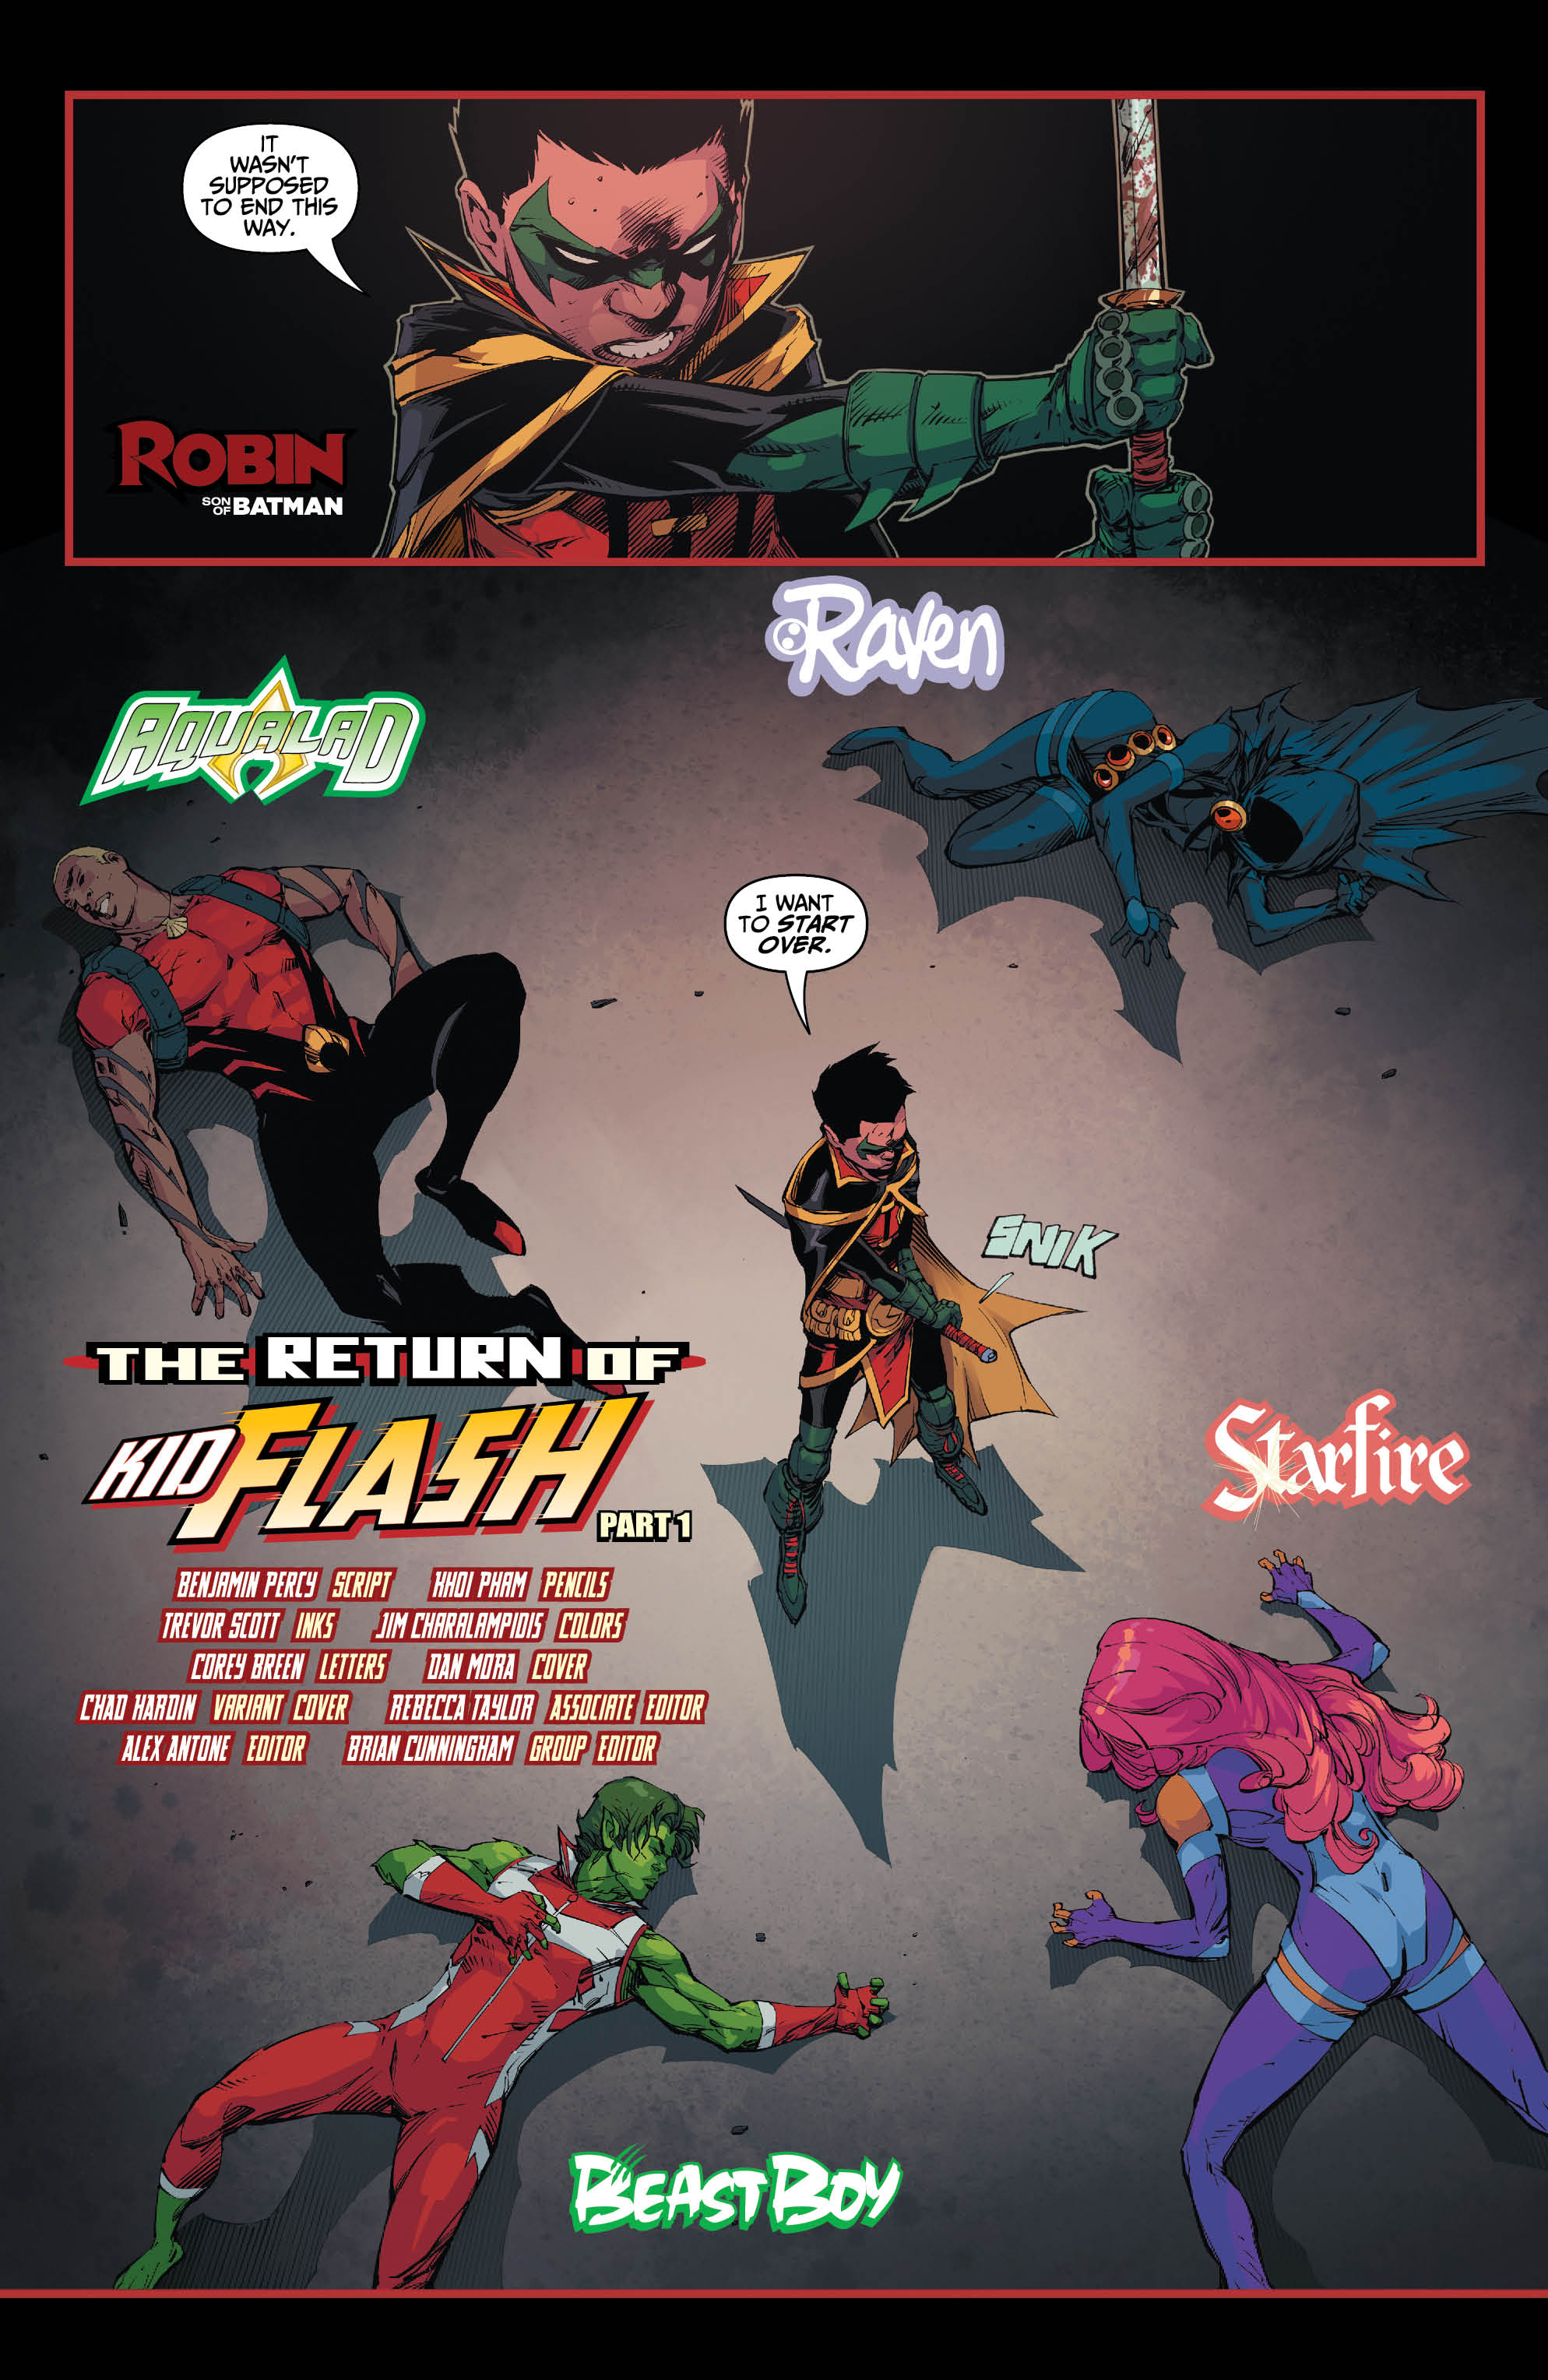 DC REBIRTH TEEN TITANS #13 VARIANT